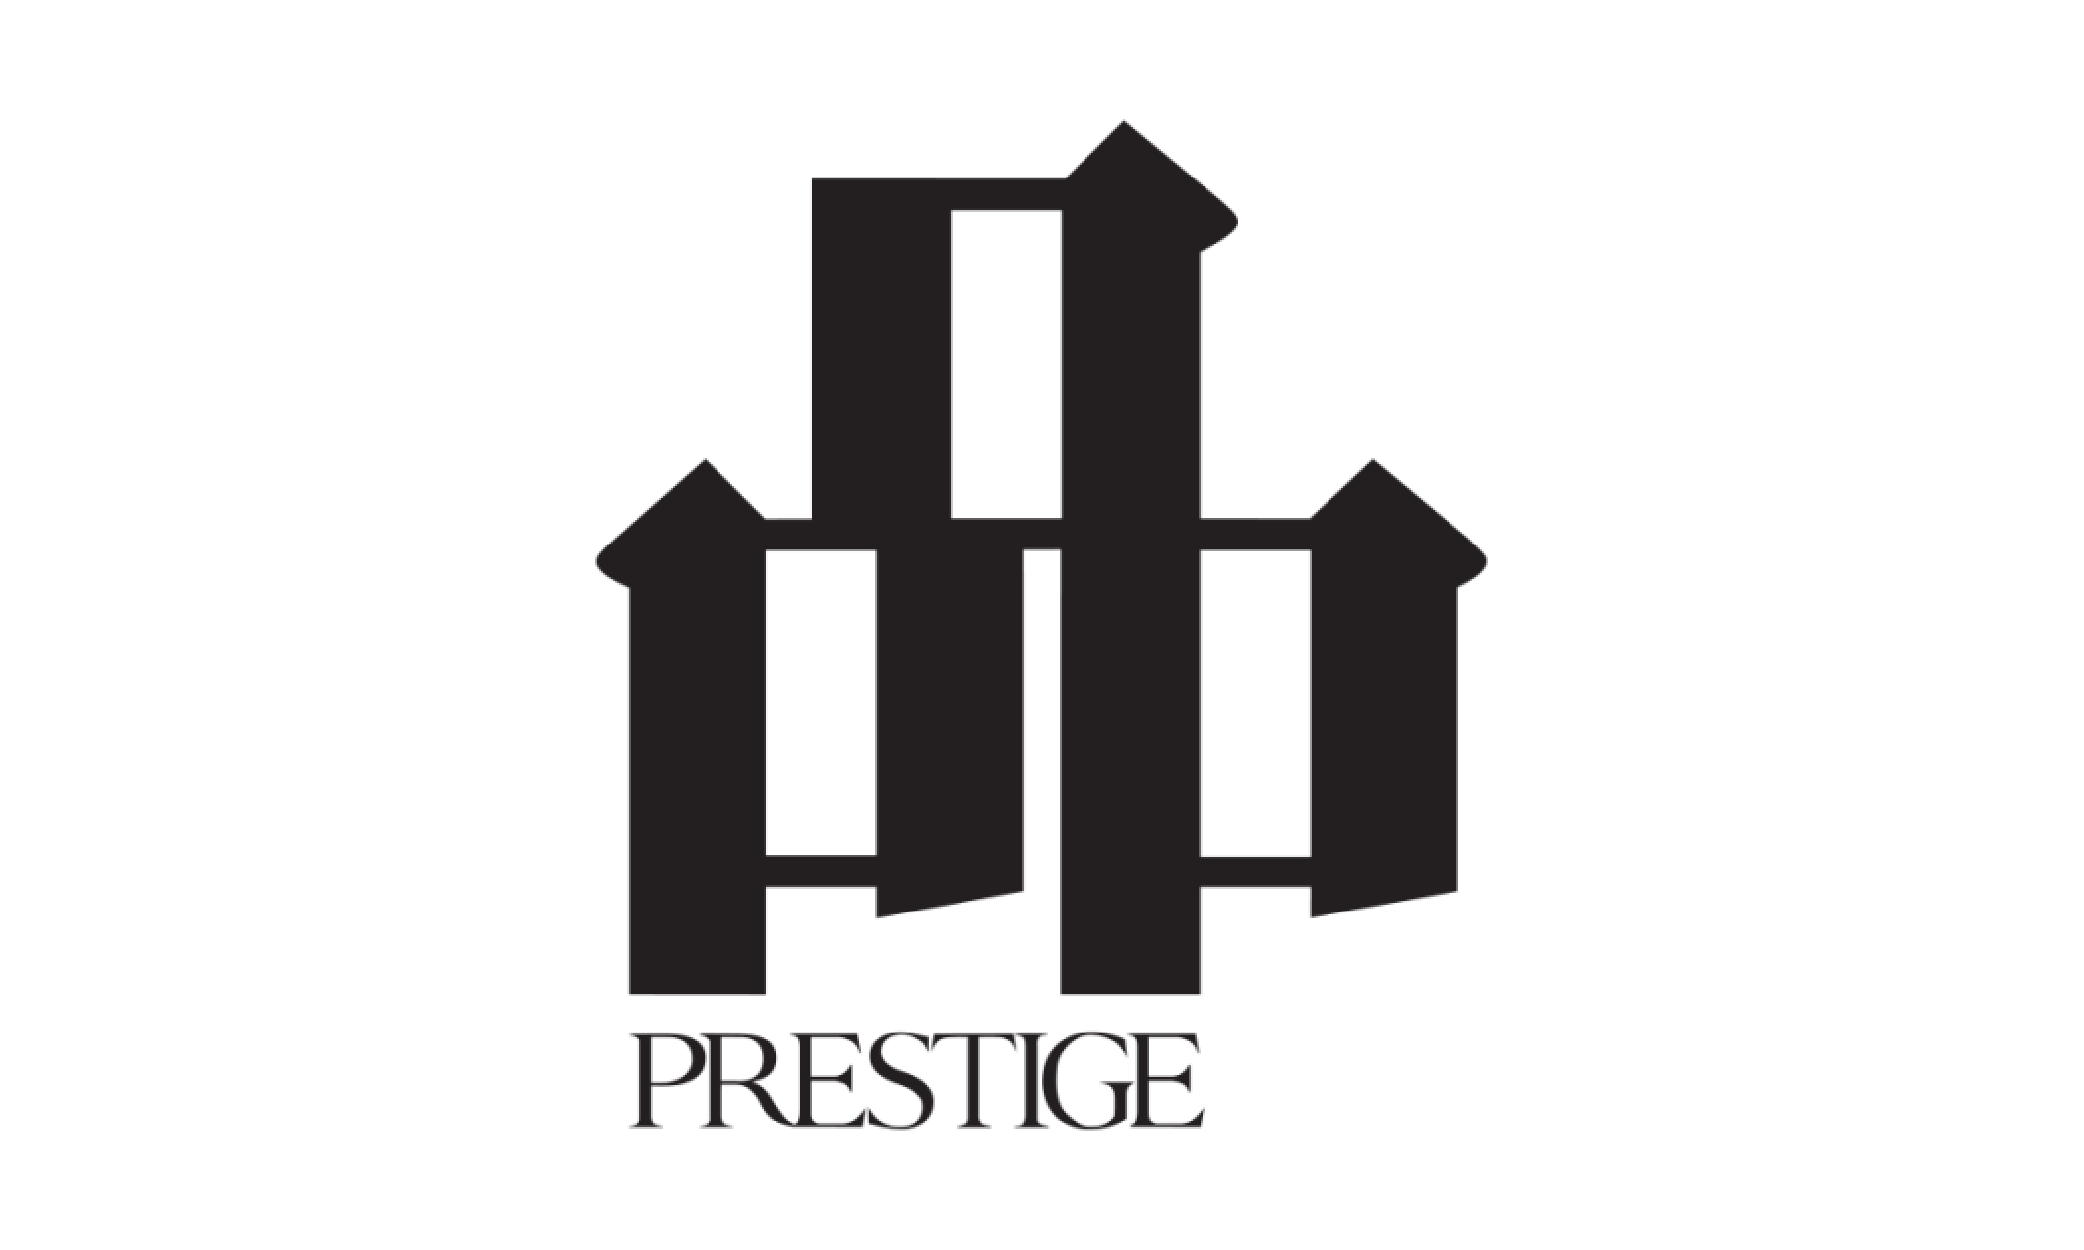 Pin Prestige.png